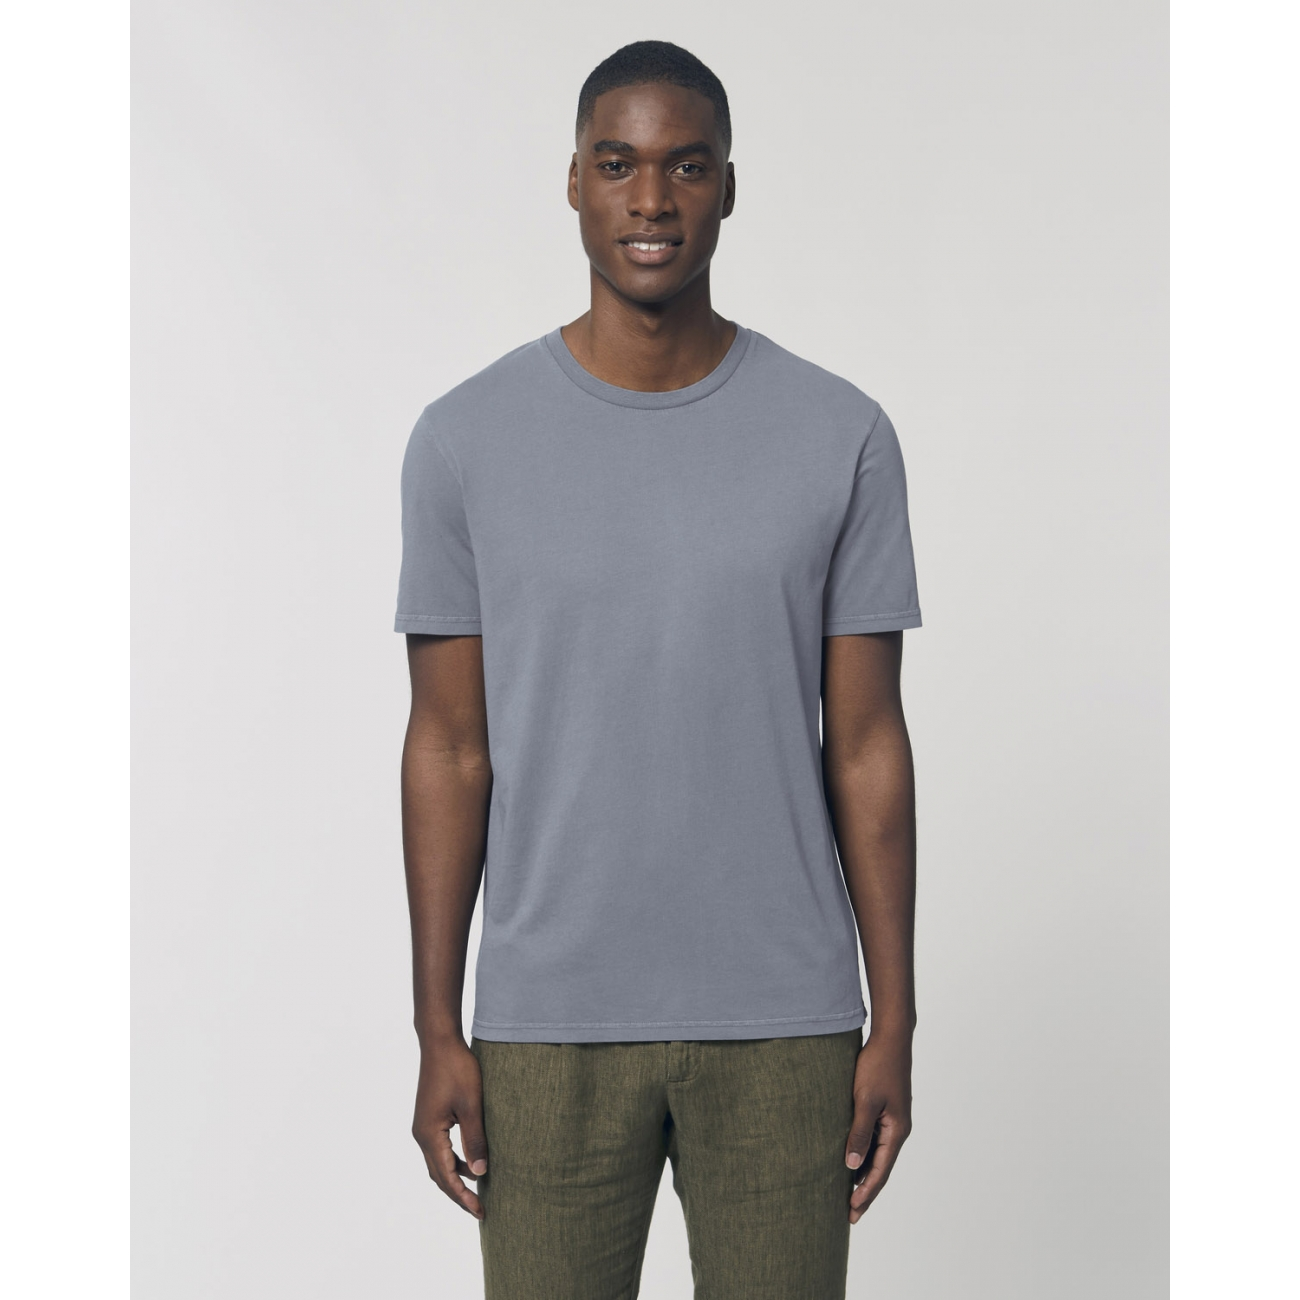 https://tee-shirt-bio.com/8633-thickbox_default/tee-shirt-style-vintage-delave-gris-lavande-coton-bio-teinte-piece.jpg